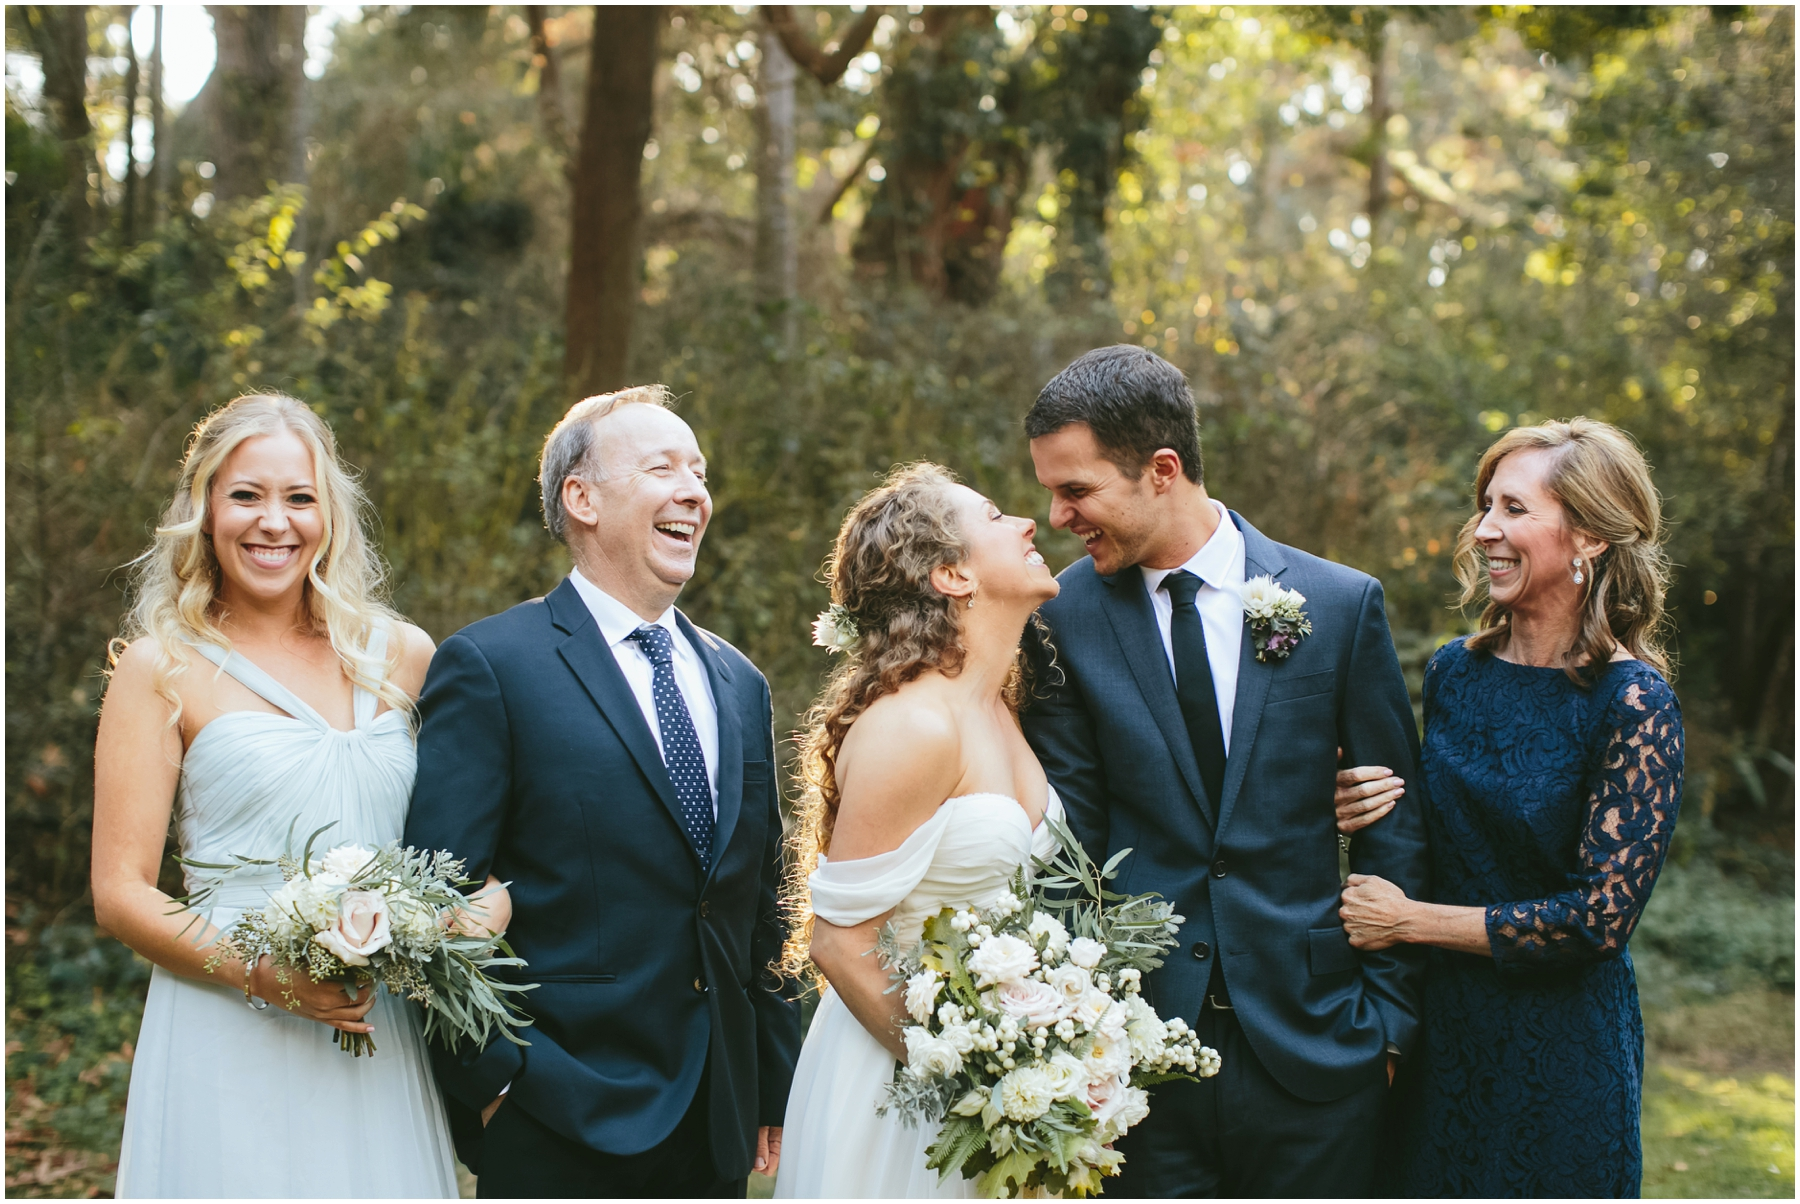 Emily+Paul-WEDDING_KellyBoitanoPhotography_0103